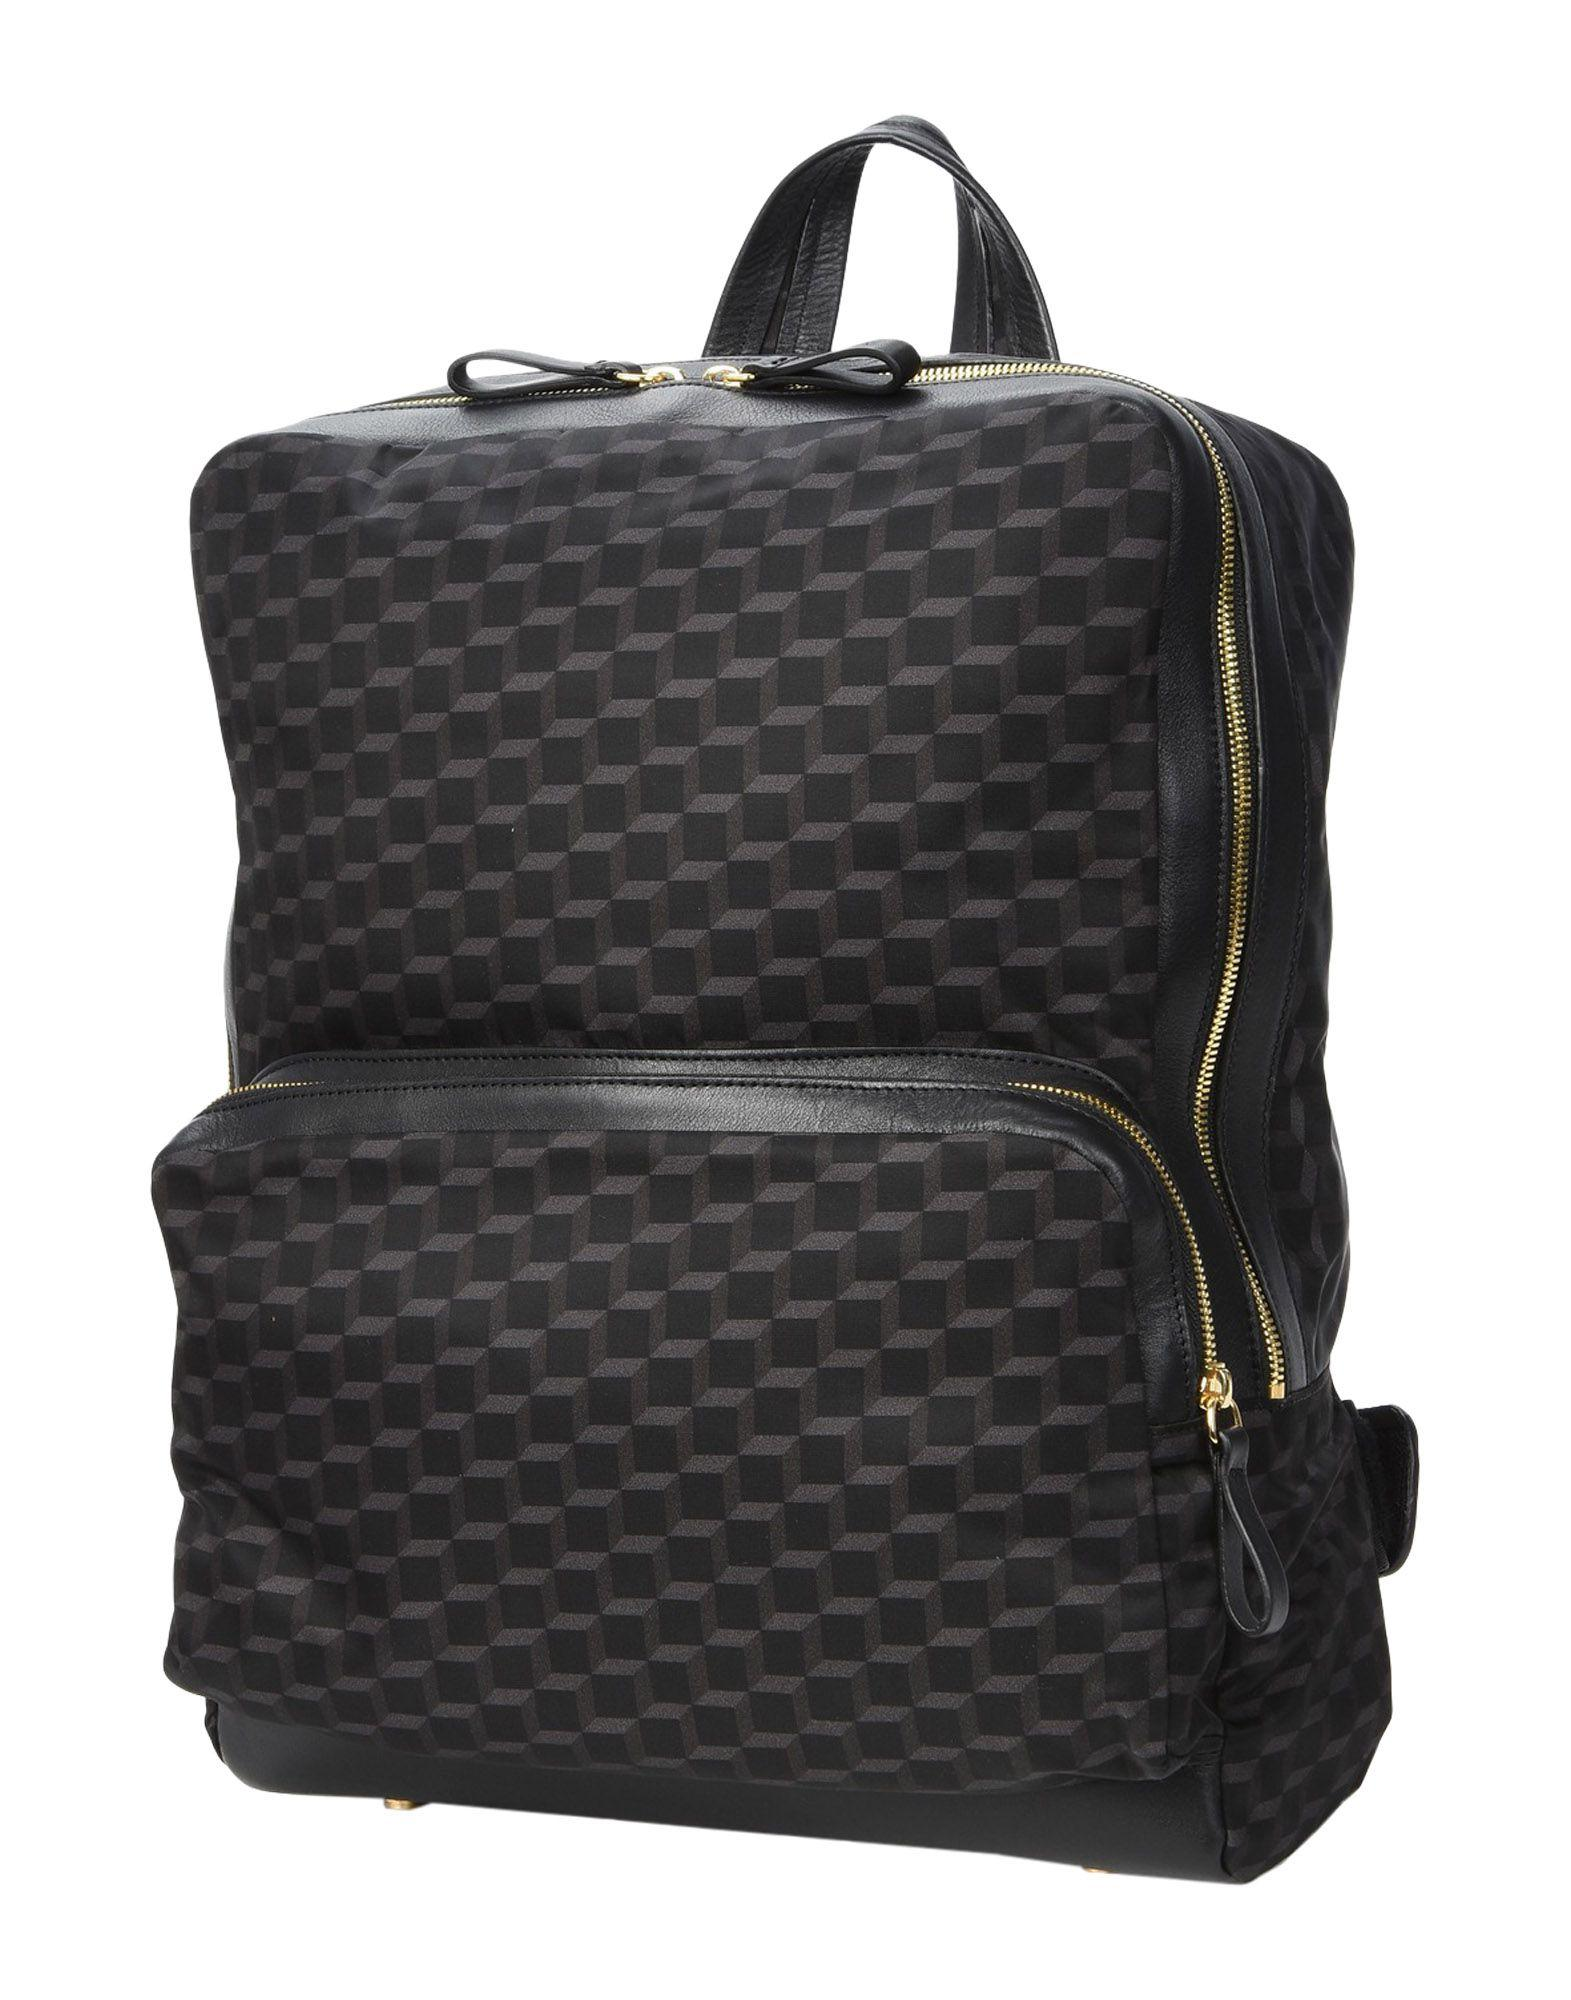 BAGS - Backpacks & Bum bags Pierre Hardy CWY4zAKy8